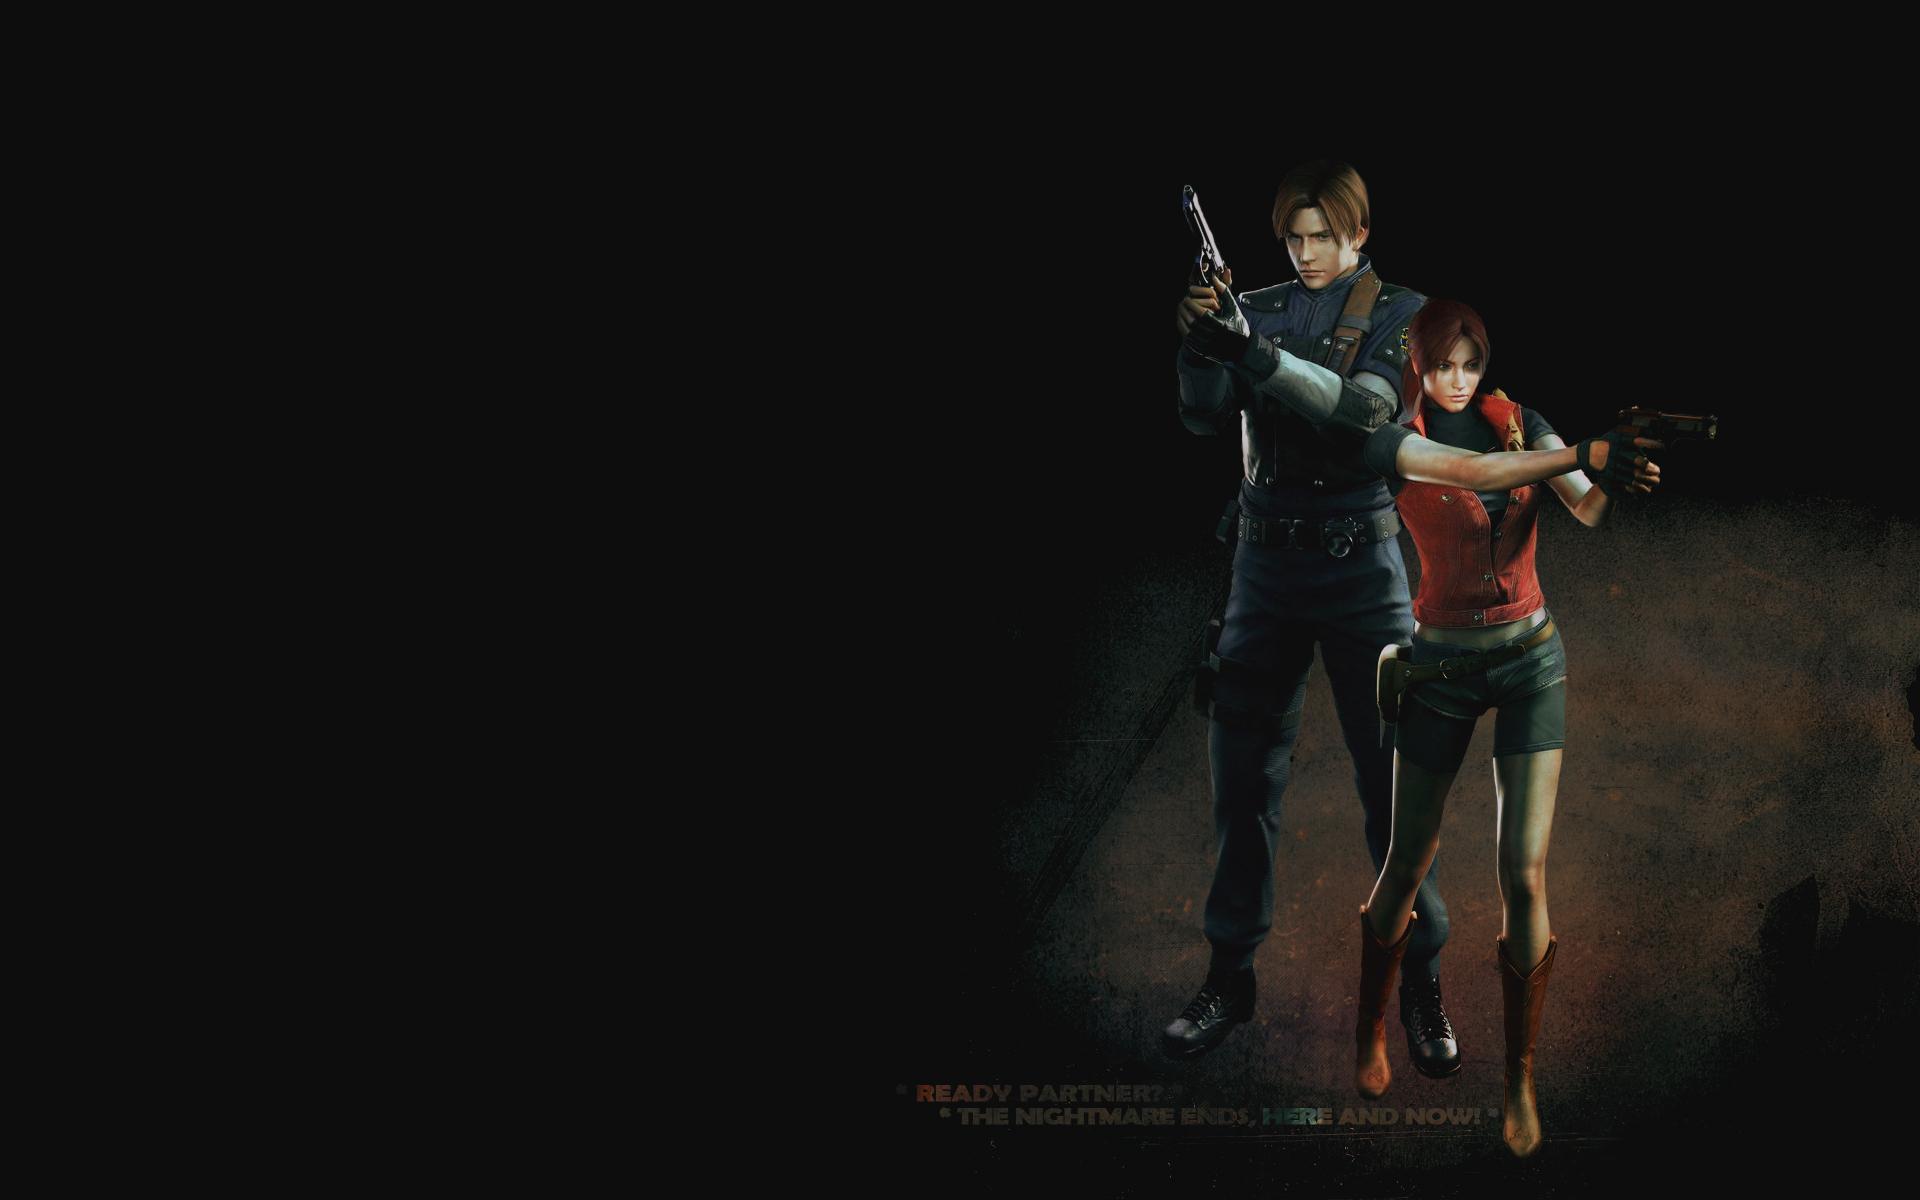 Resident Evil 2 Wallpaper: Resident Evil 2 Wallpaper